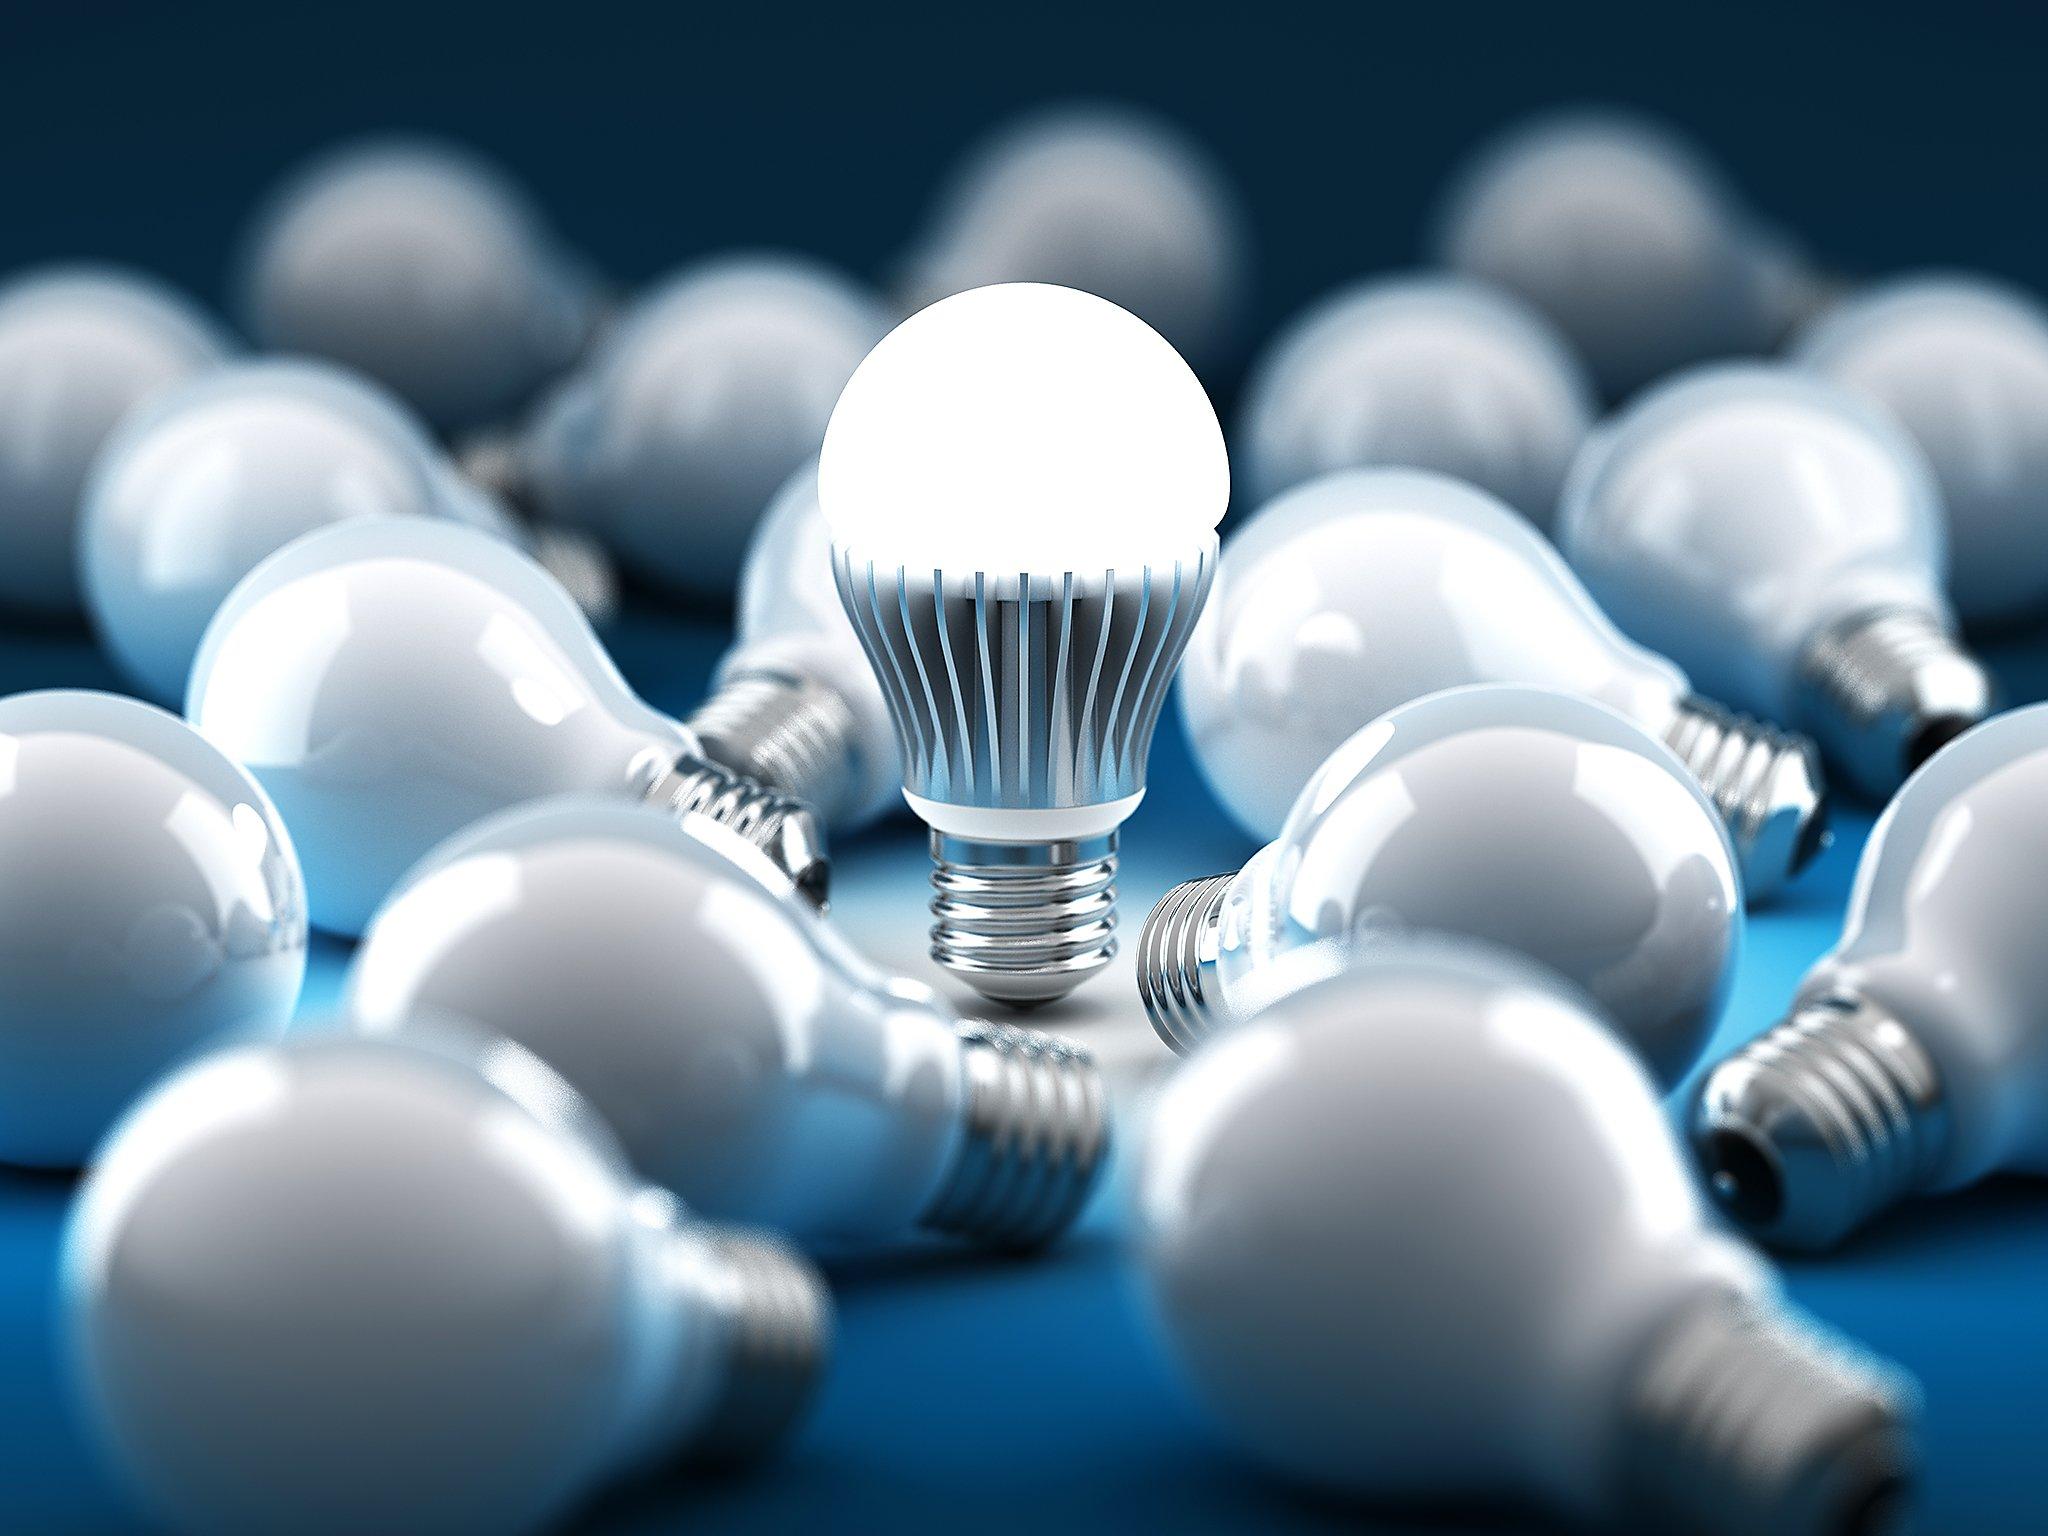 Risparmio lampadine led si risparmia davvero revoluce for Lampadine casa led